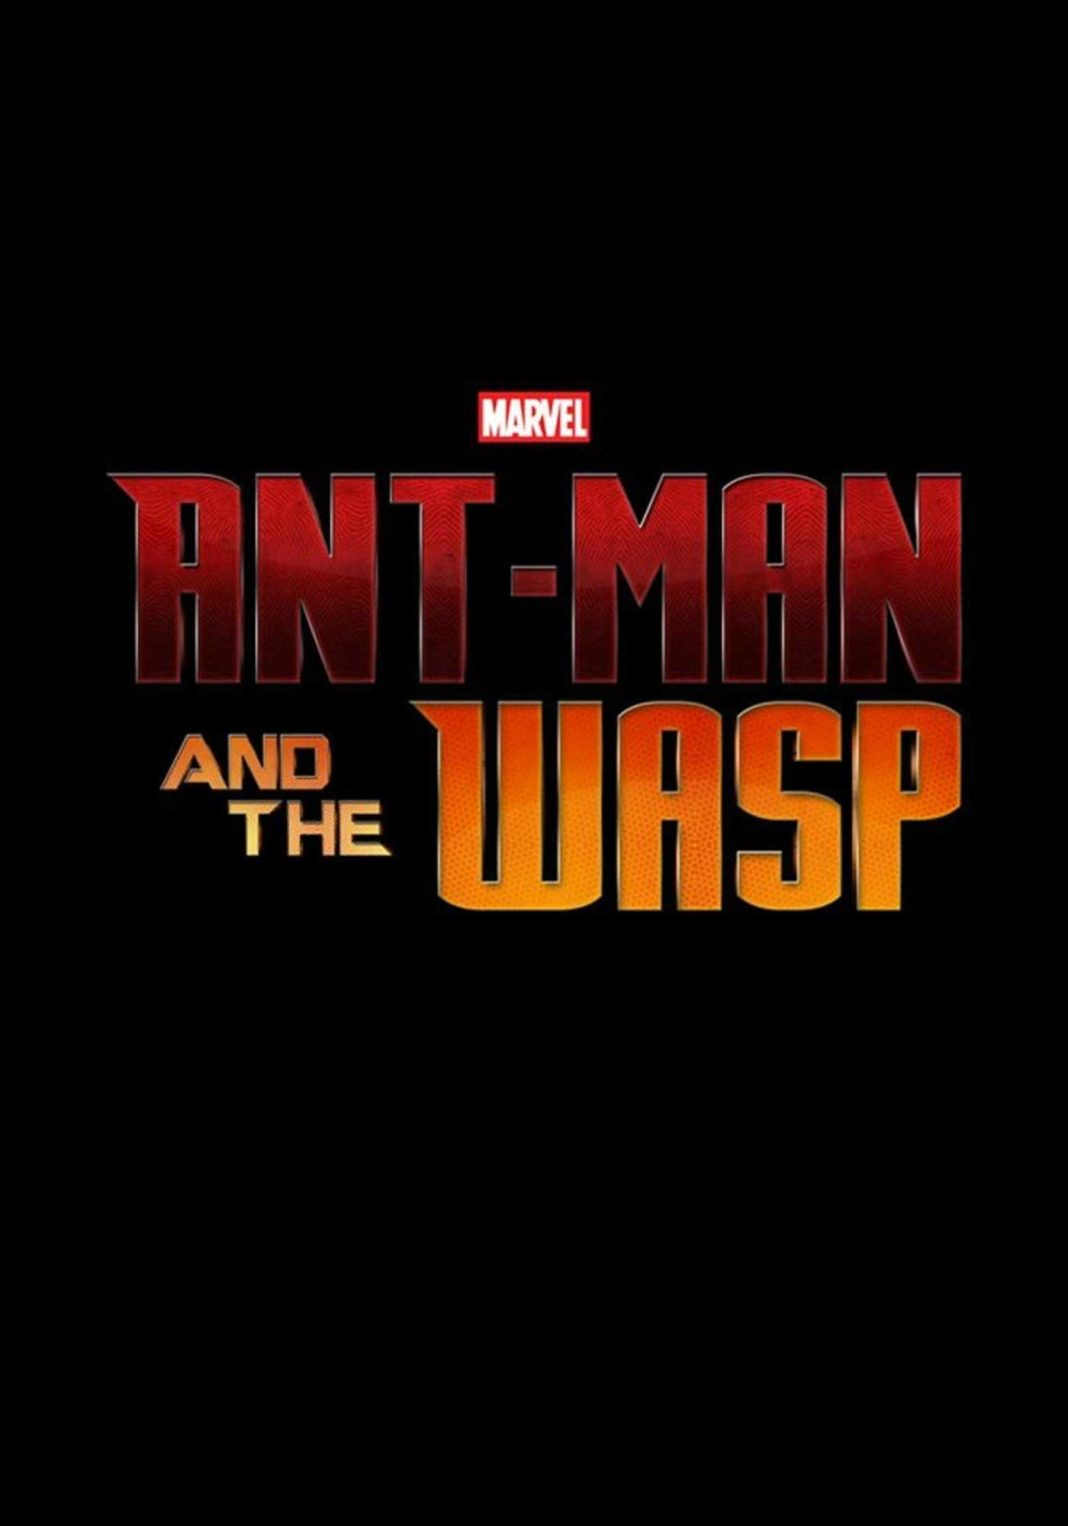 affiche poster ant-man guepe wasp disney marvel